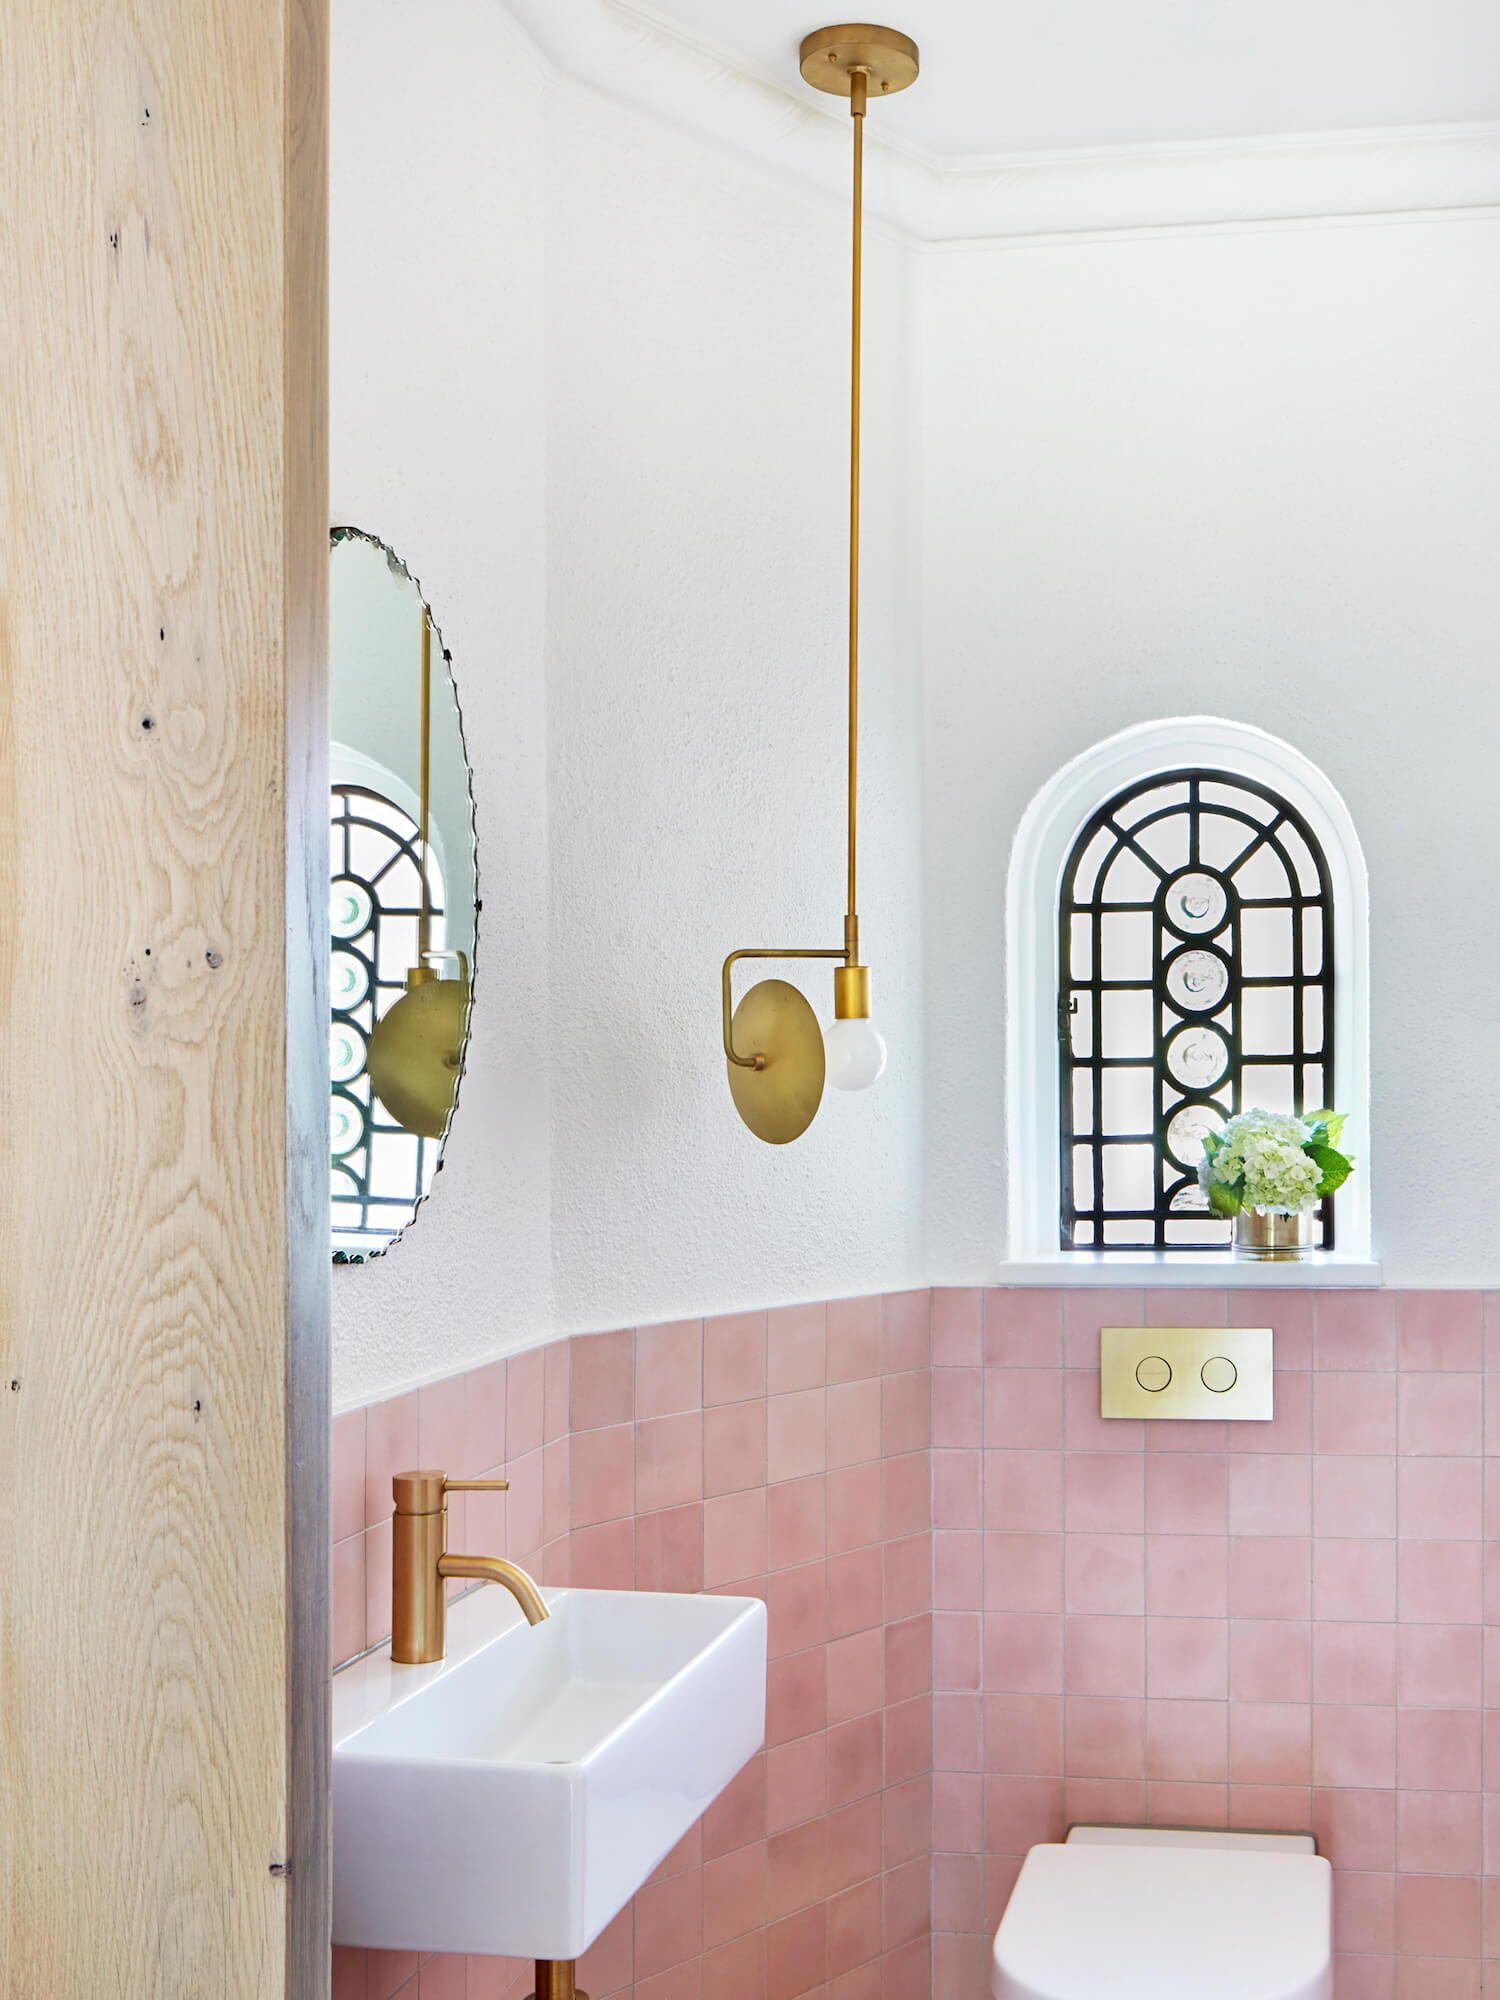 Etre living Blog   Home ideas   Pinterest   Bathroom laundry, House ...